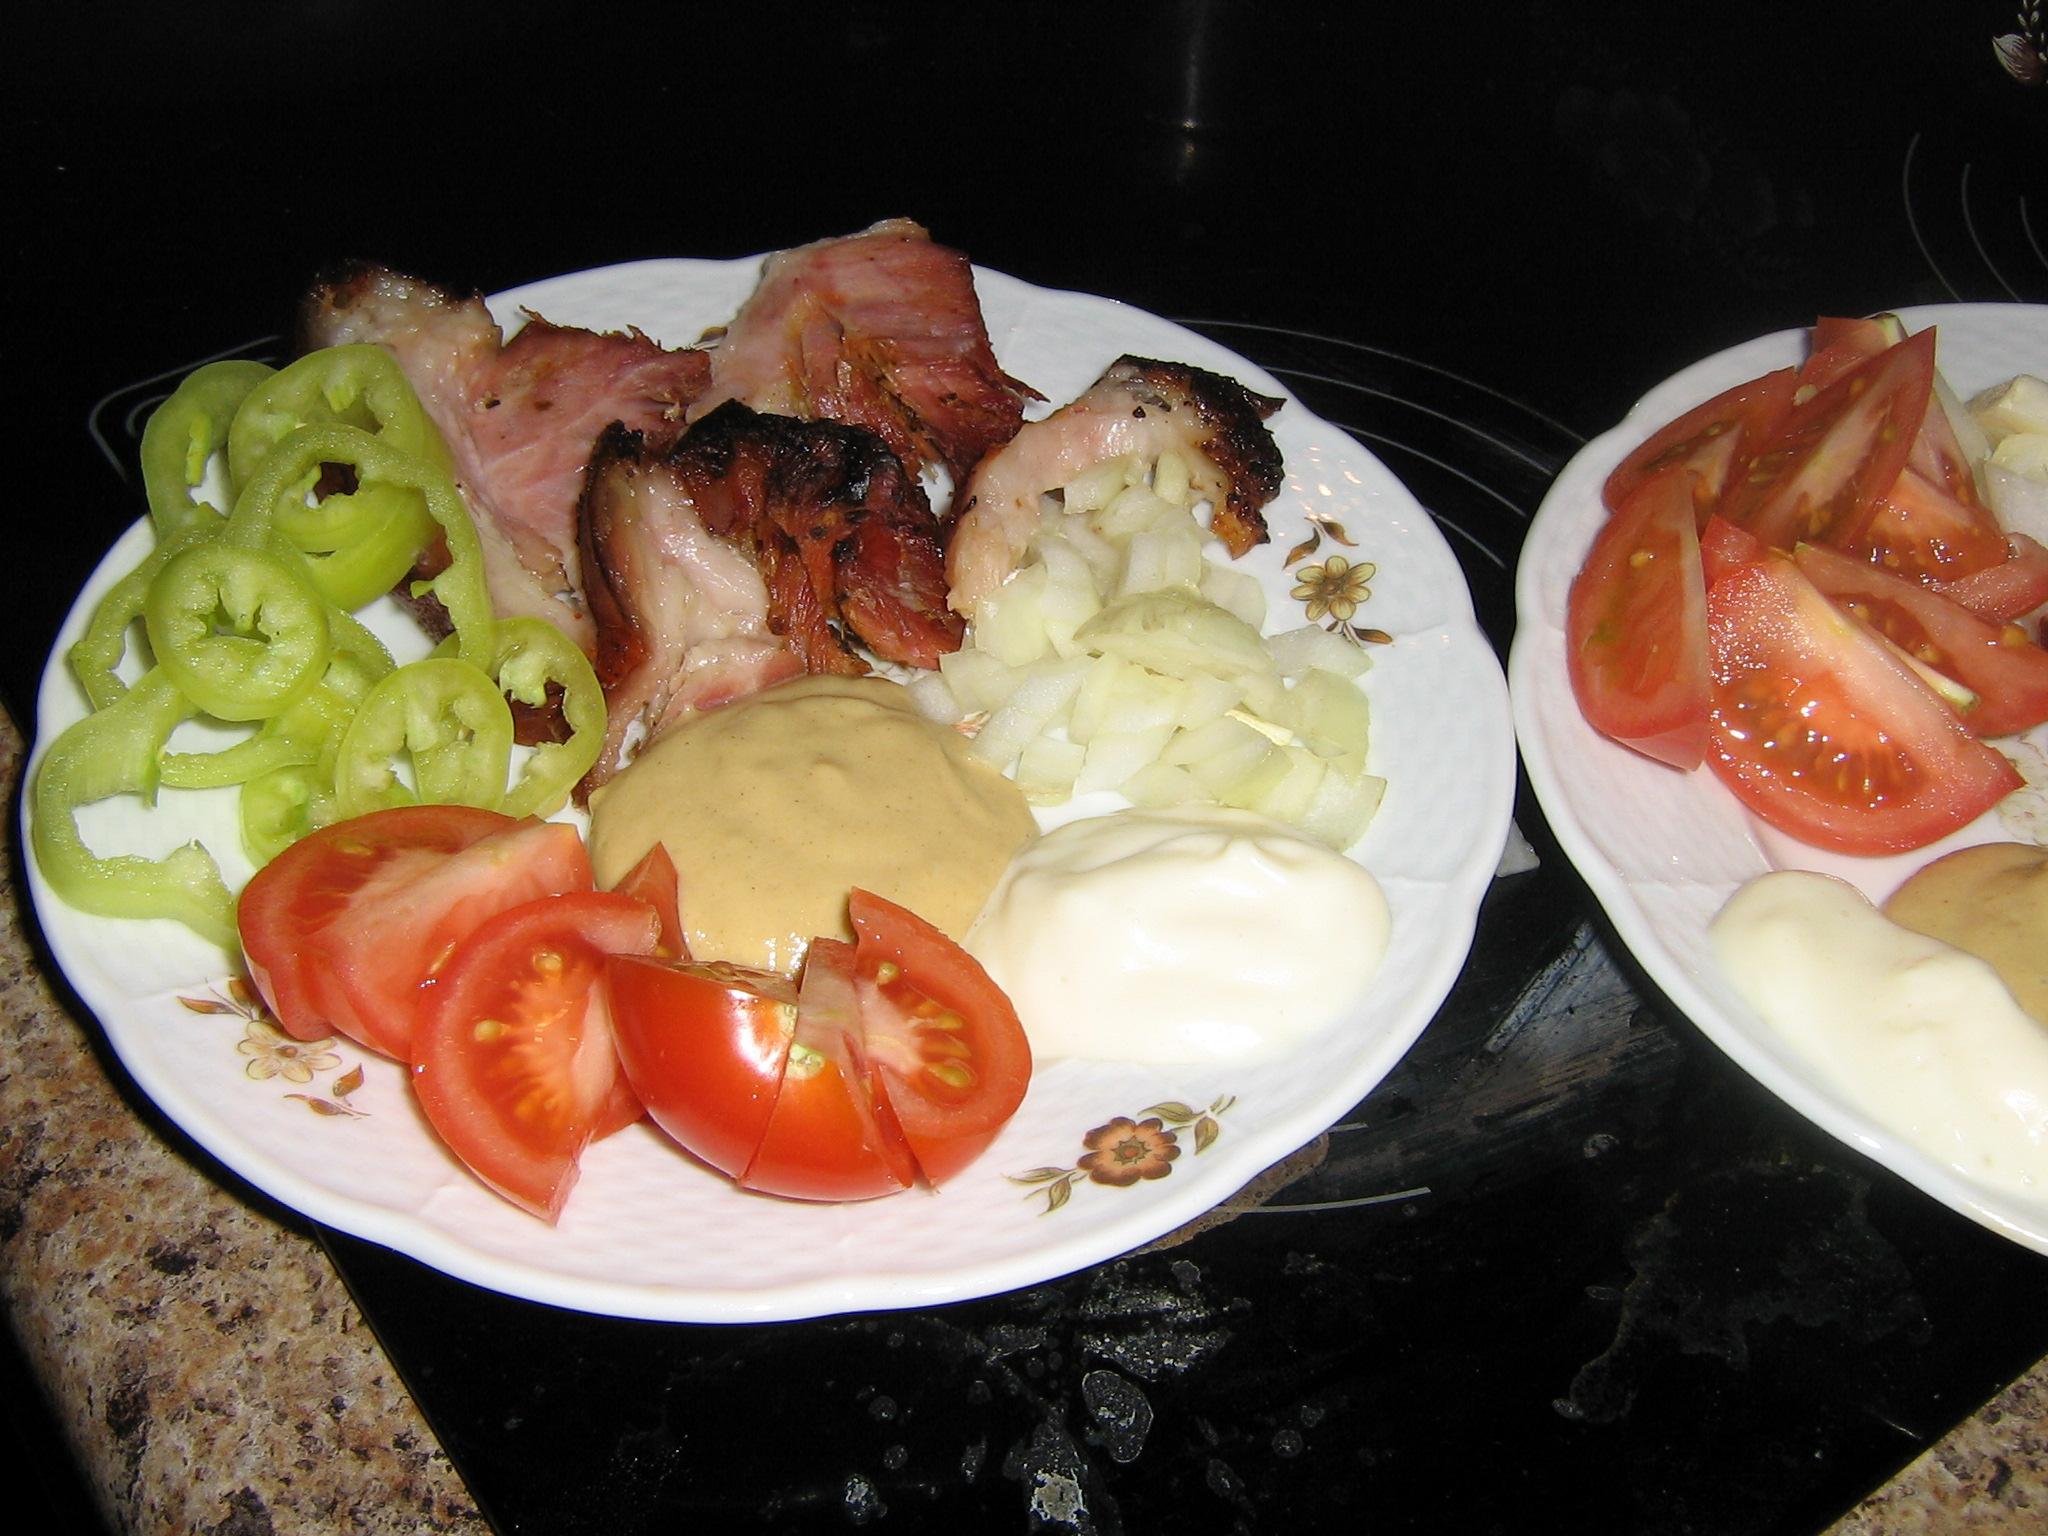 Yvetina kuchařka oblíbených receptů